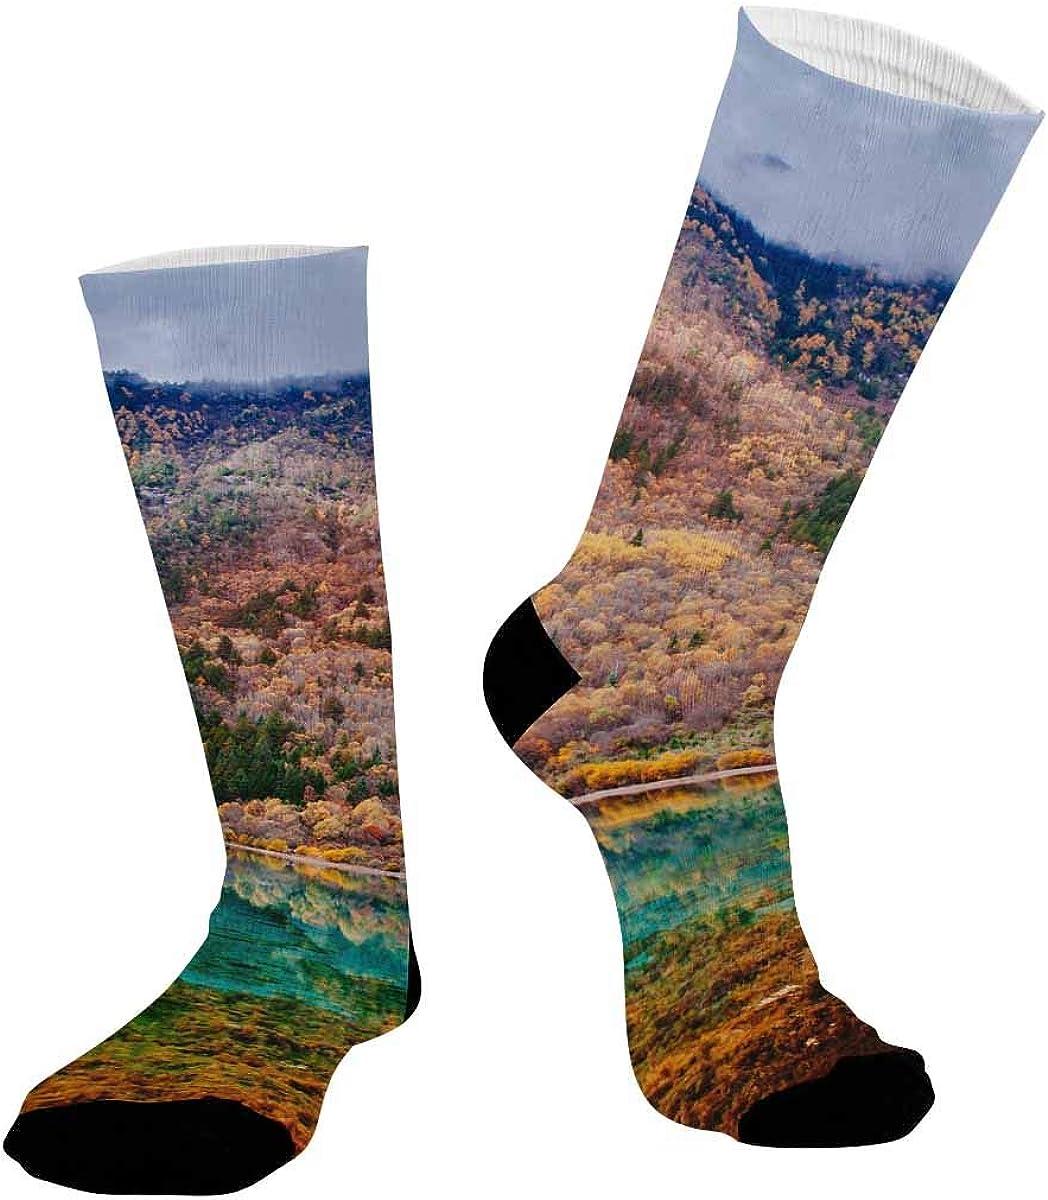 INTERESTPRINT Breathable Sublimated Crew Socks Outdoor Athletic Socks Jiuzhaigou National Park